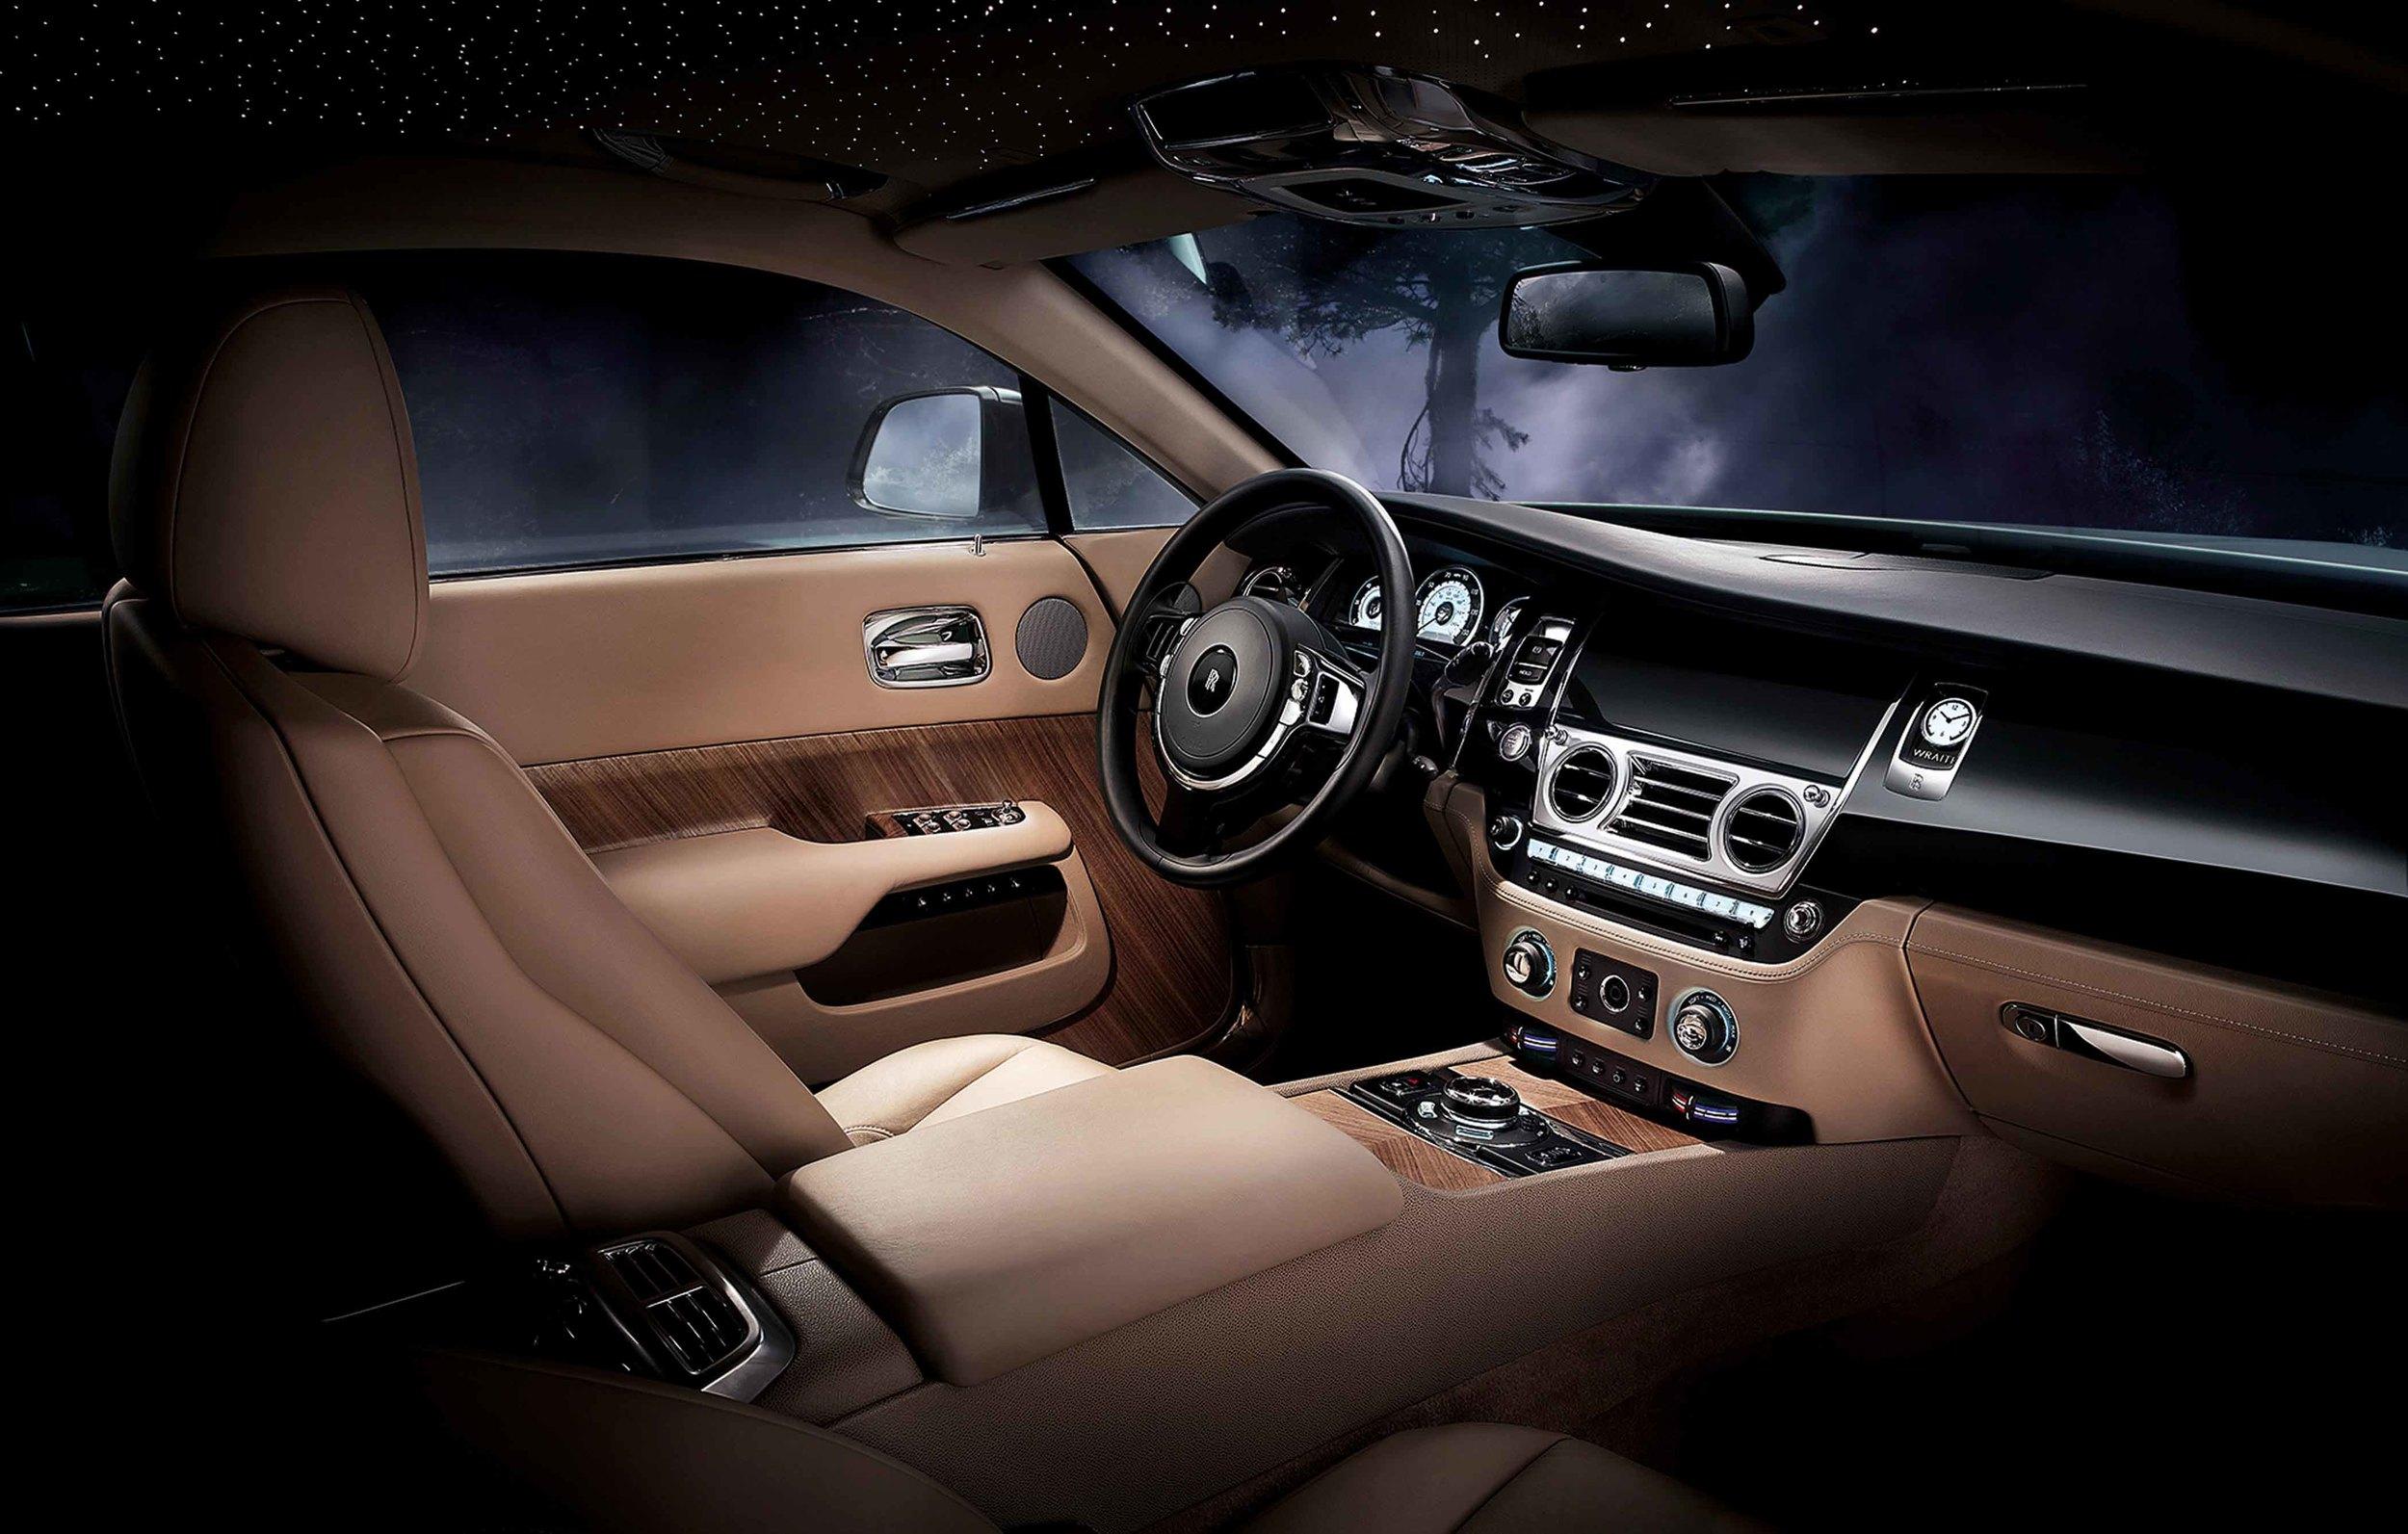 The Wraith (image courtesy of Rolls-Royce)